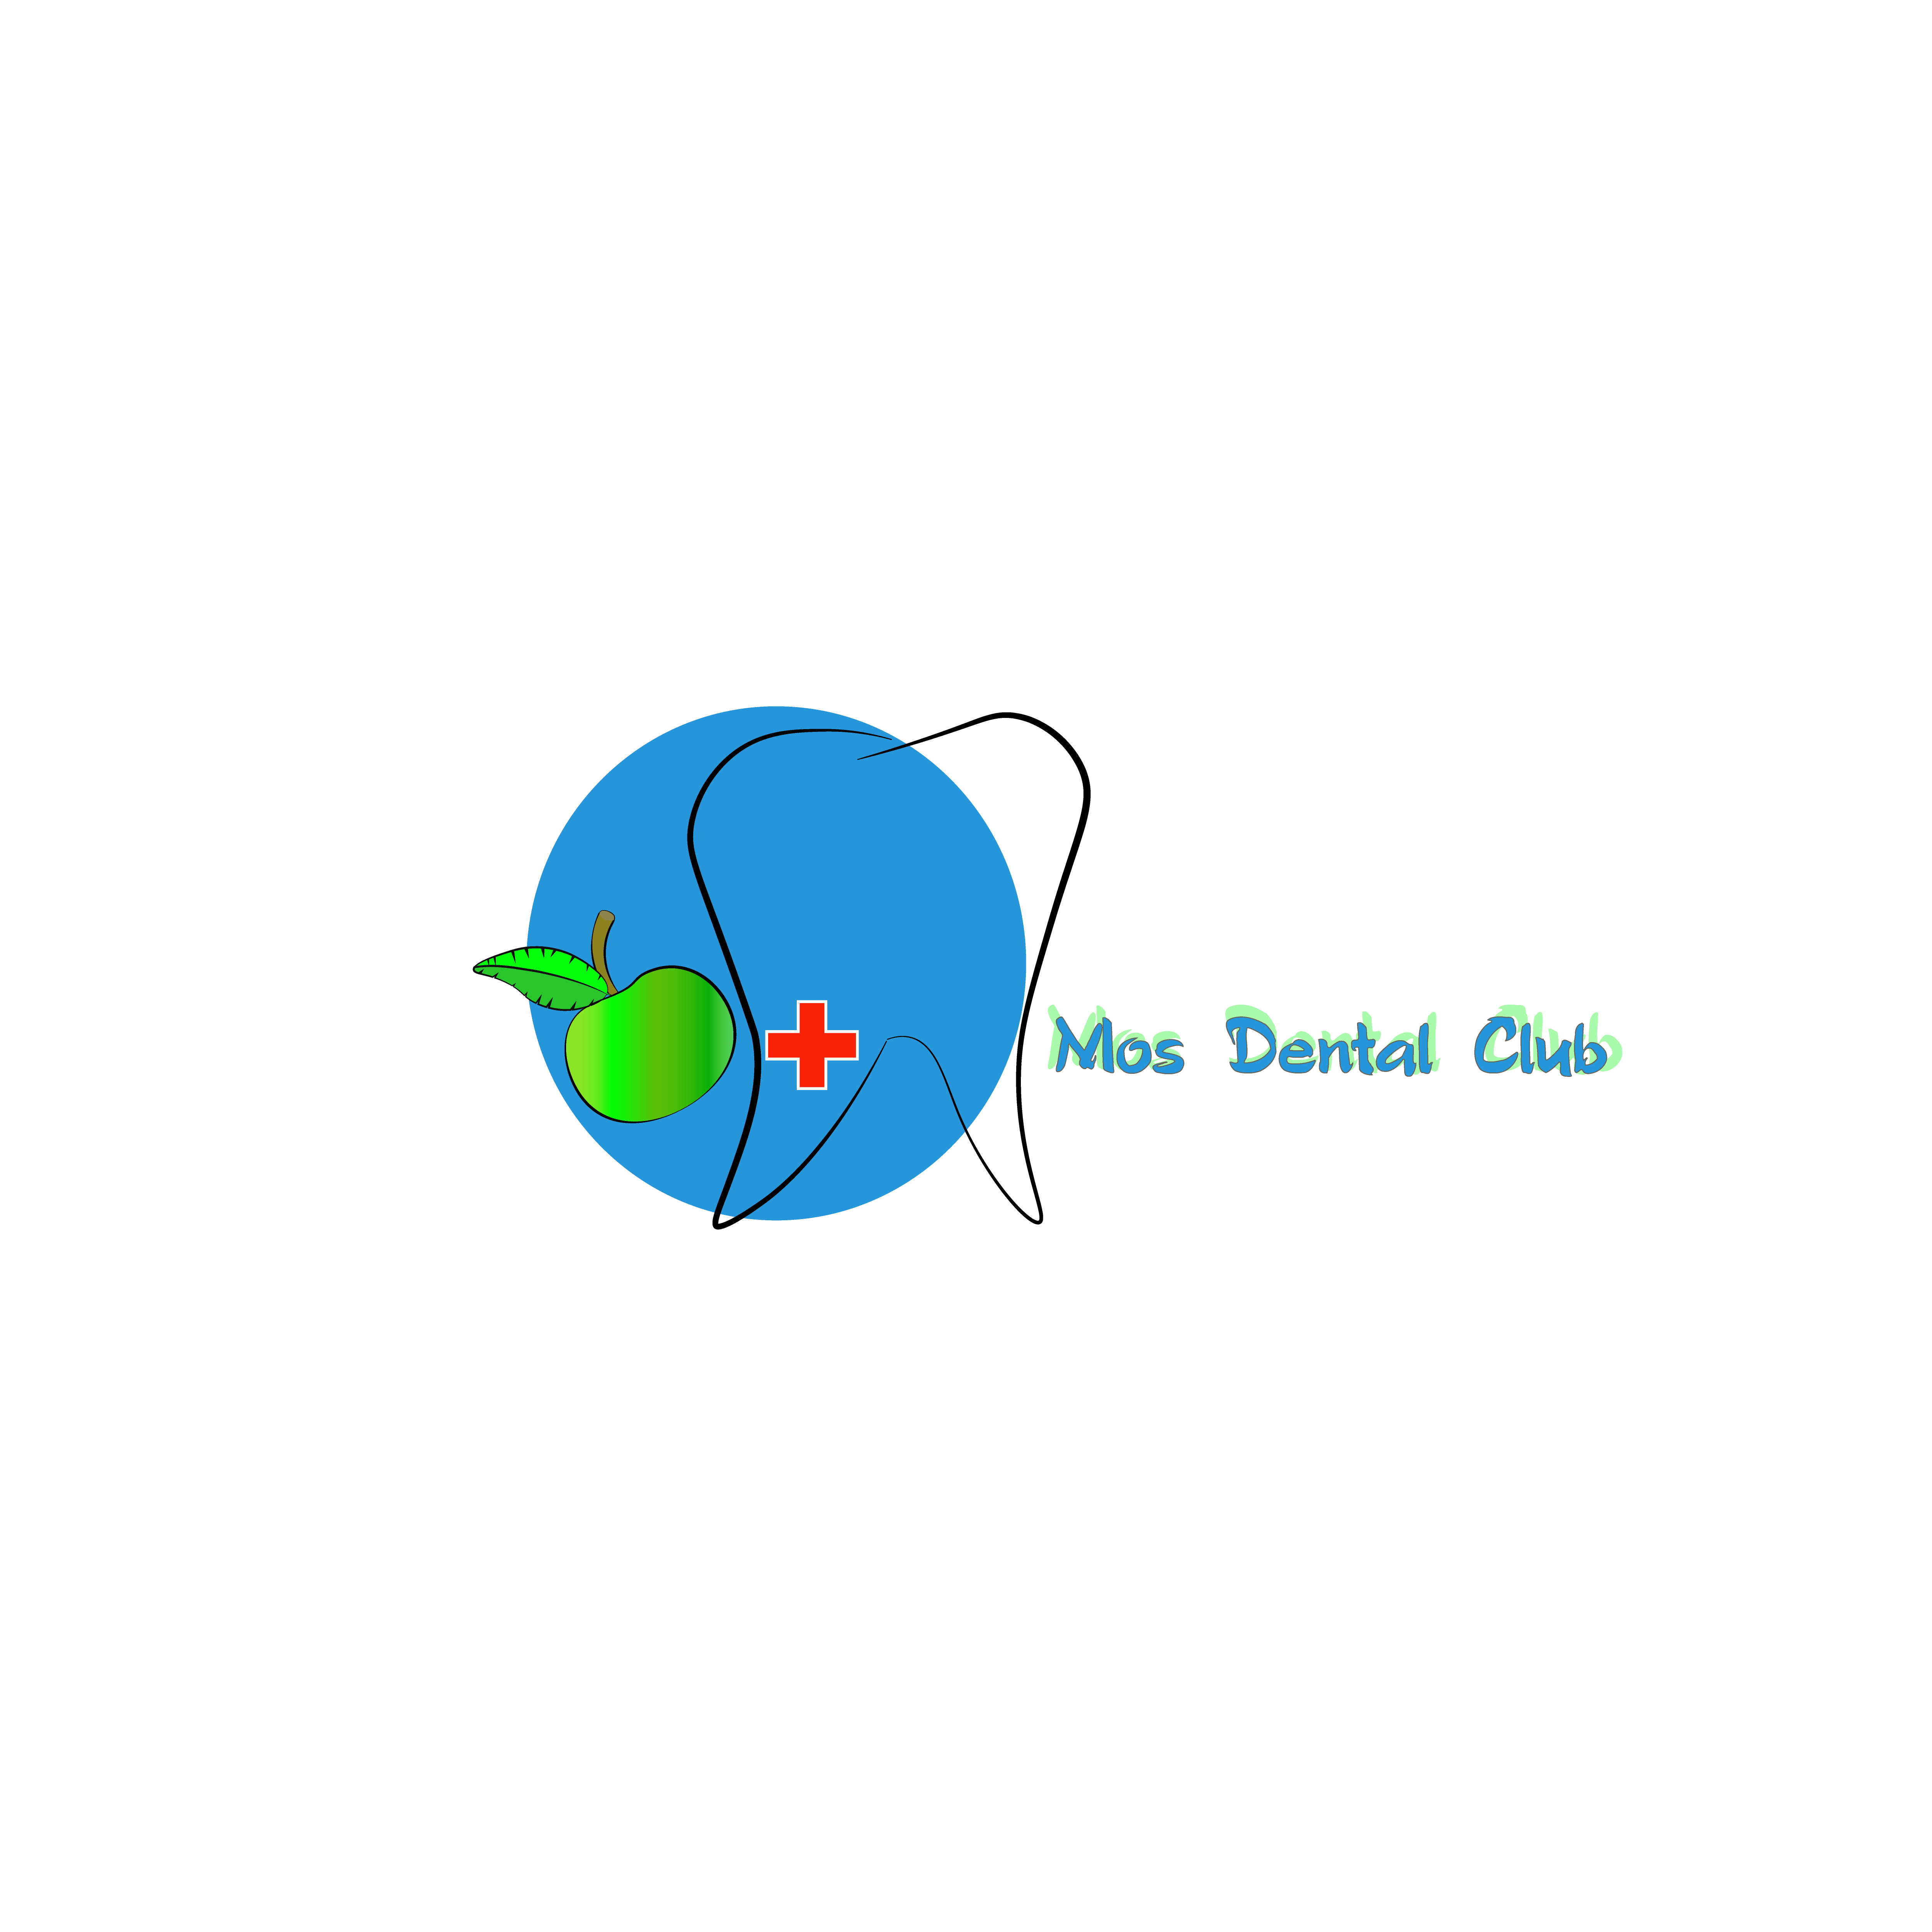 Разработка логотипа стоматологического медицинского центра фото f_9275e46c3395efd7.jpg